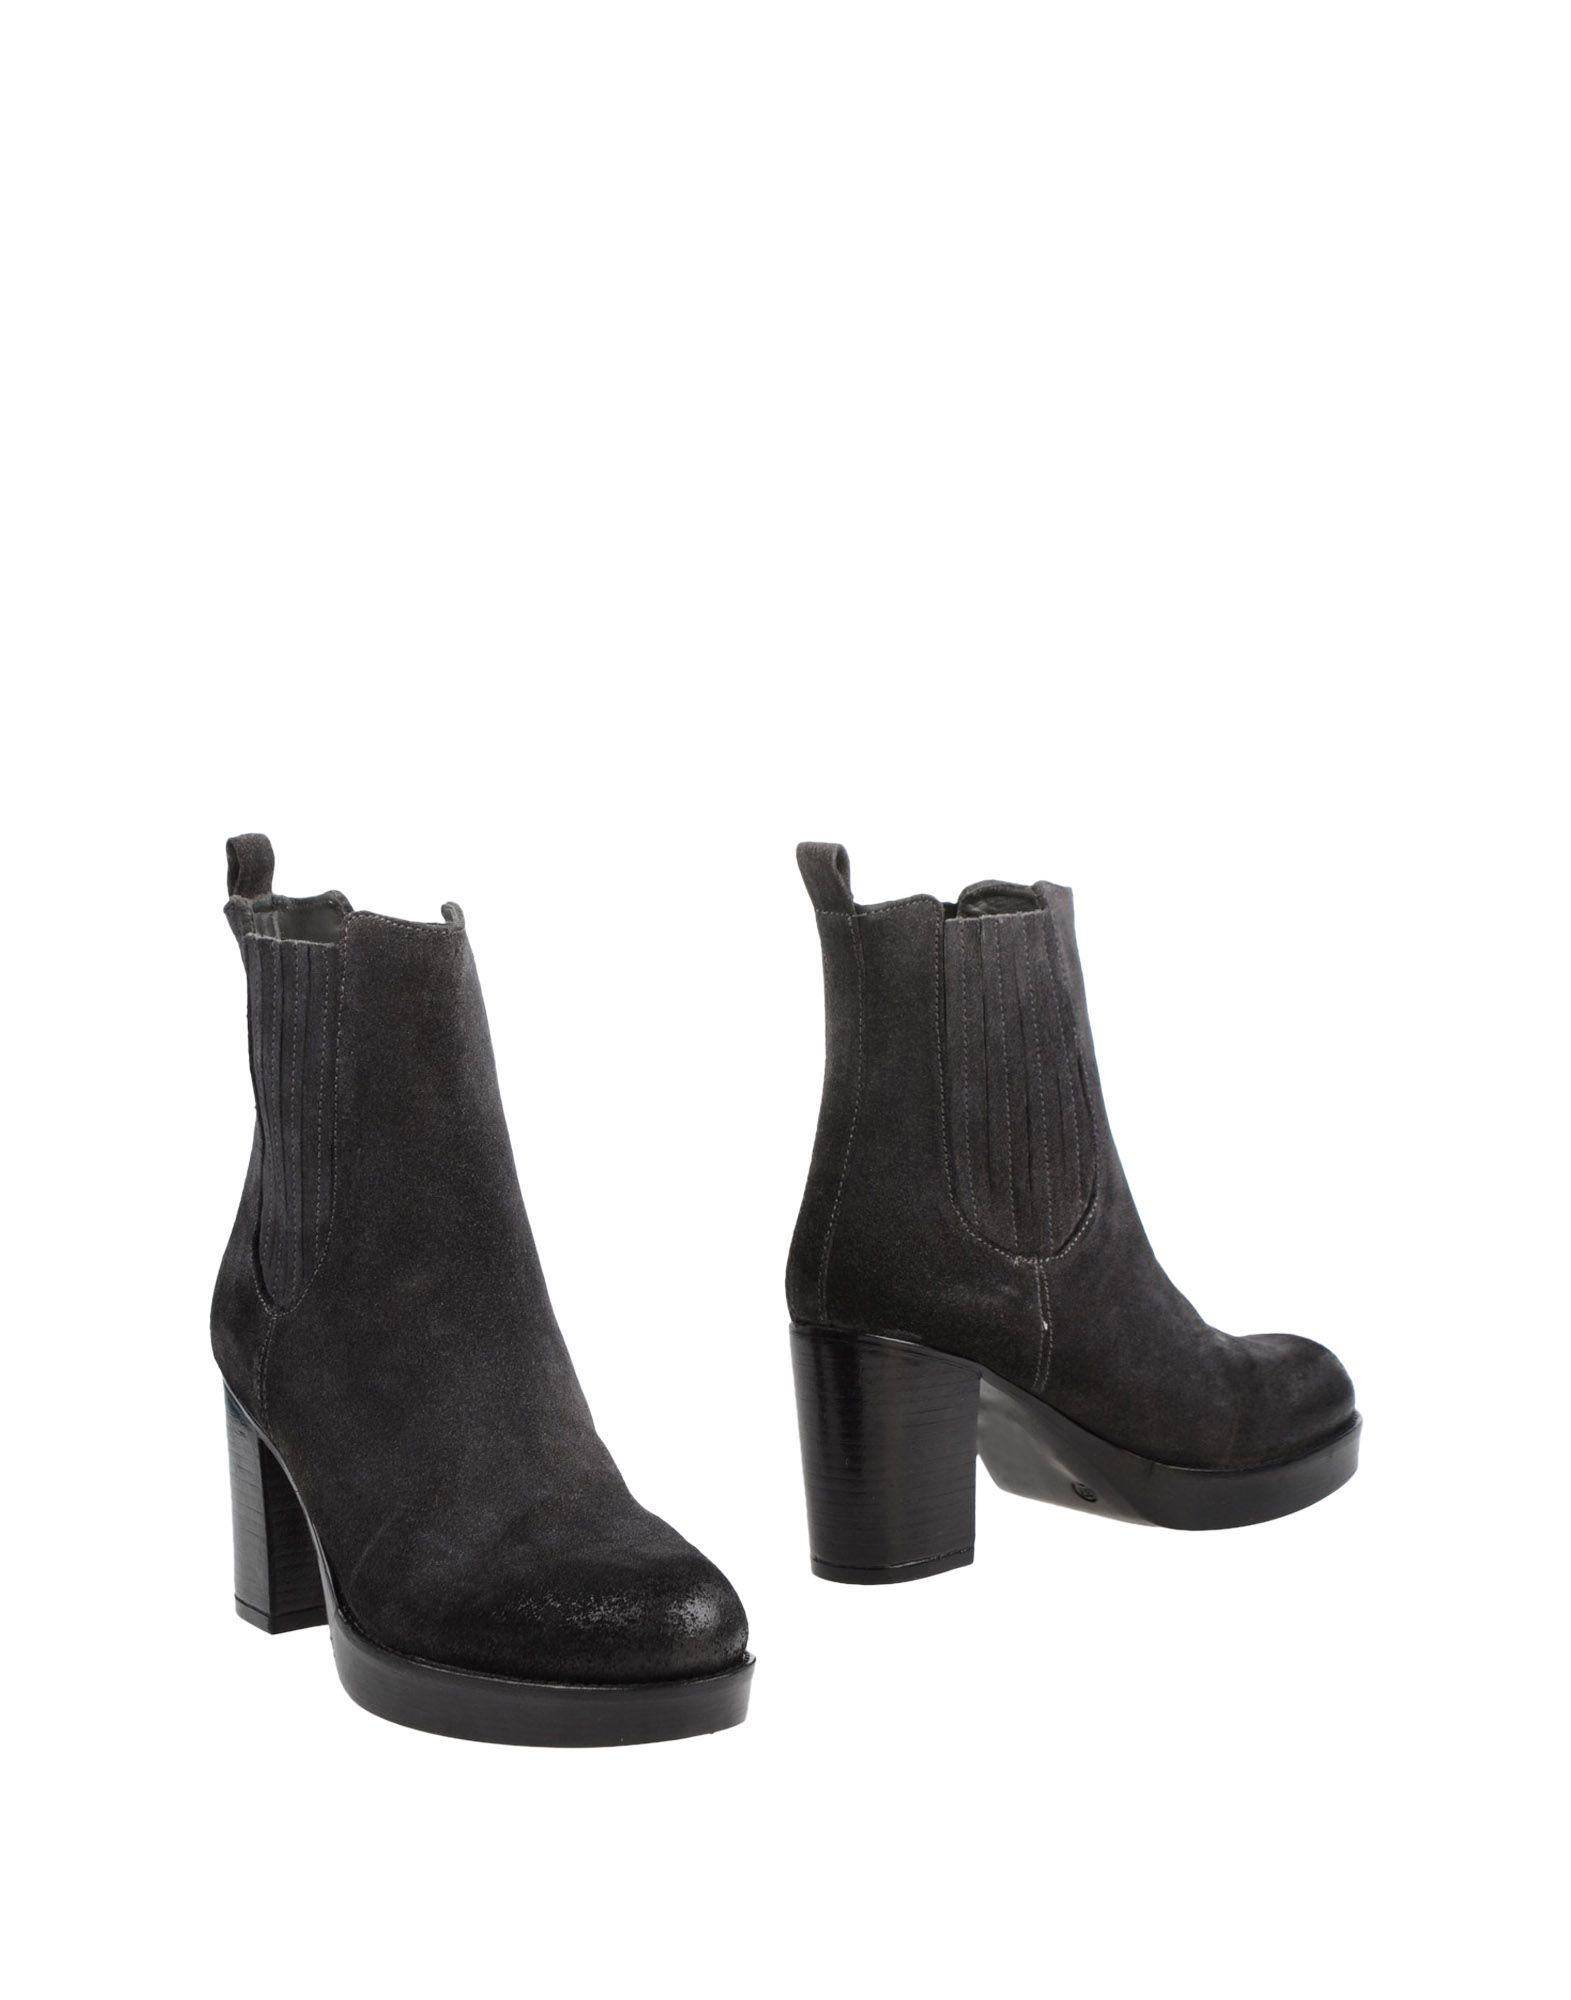 E...Vee 11227933HM Stiefelette Damen  11227933HM E...Vee Gute Qualität beliebte Schuhe 917564